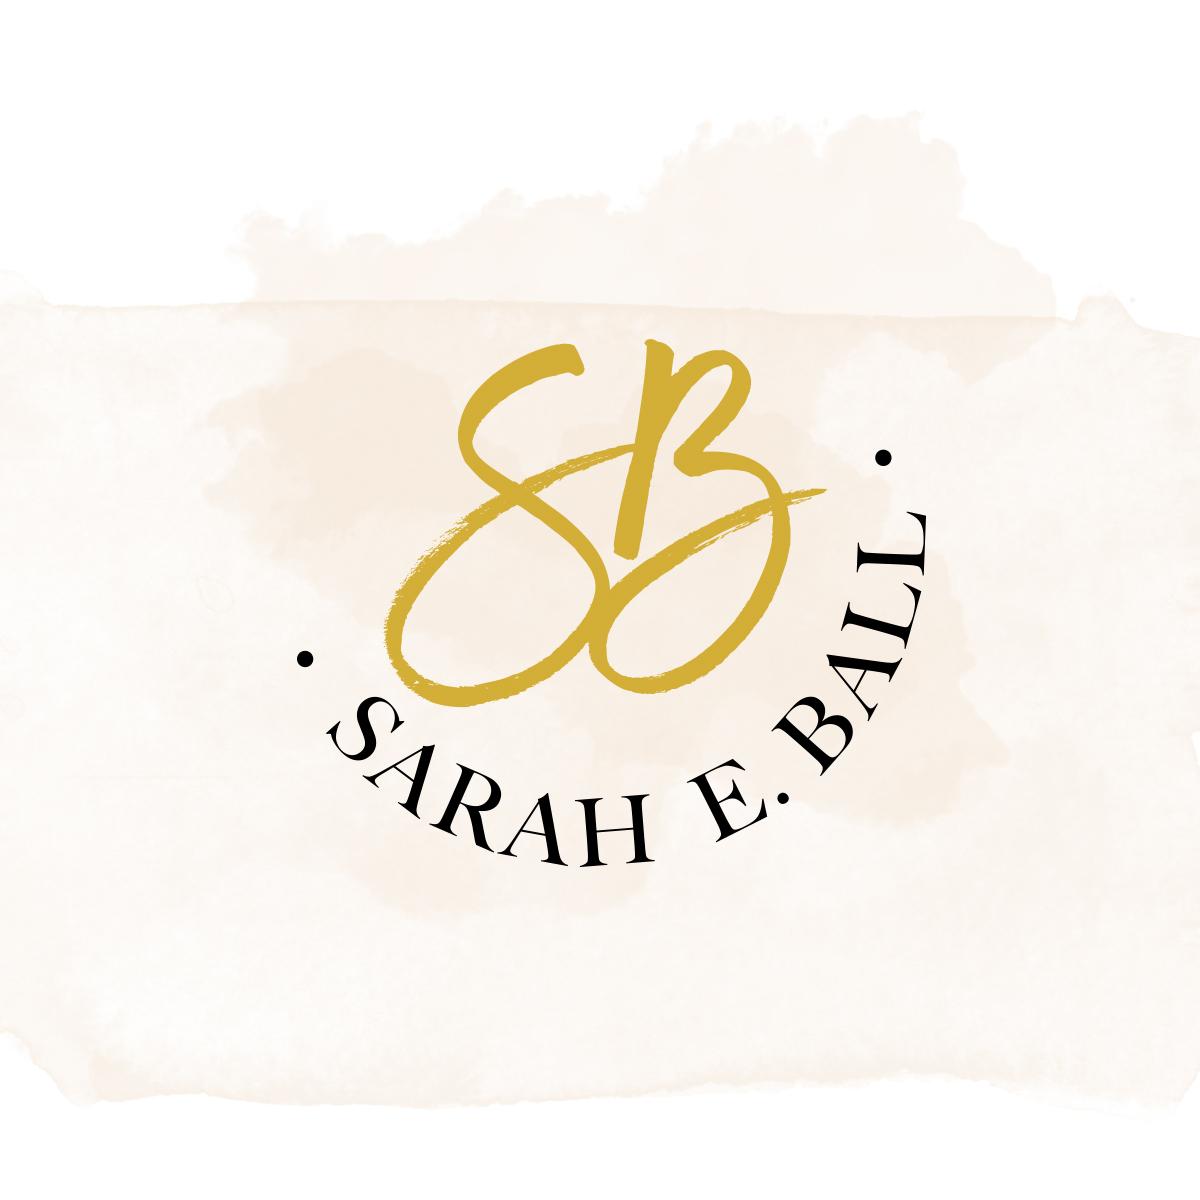 SarahBall_Submark_Insta.jpg